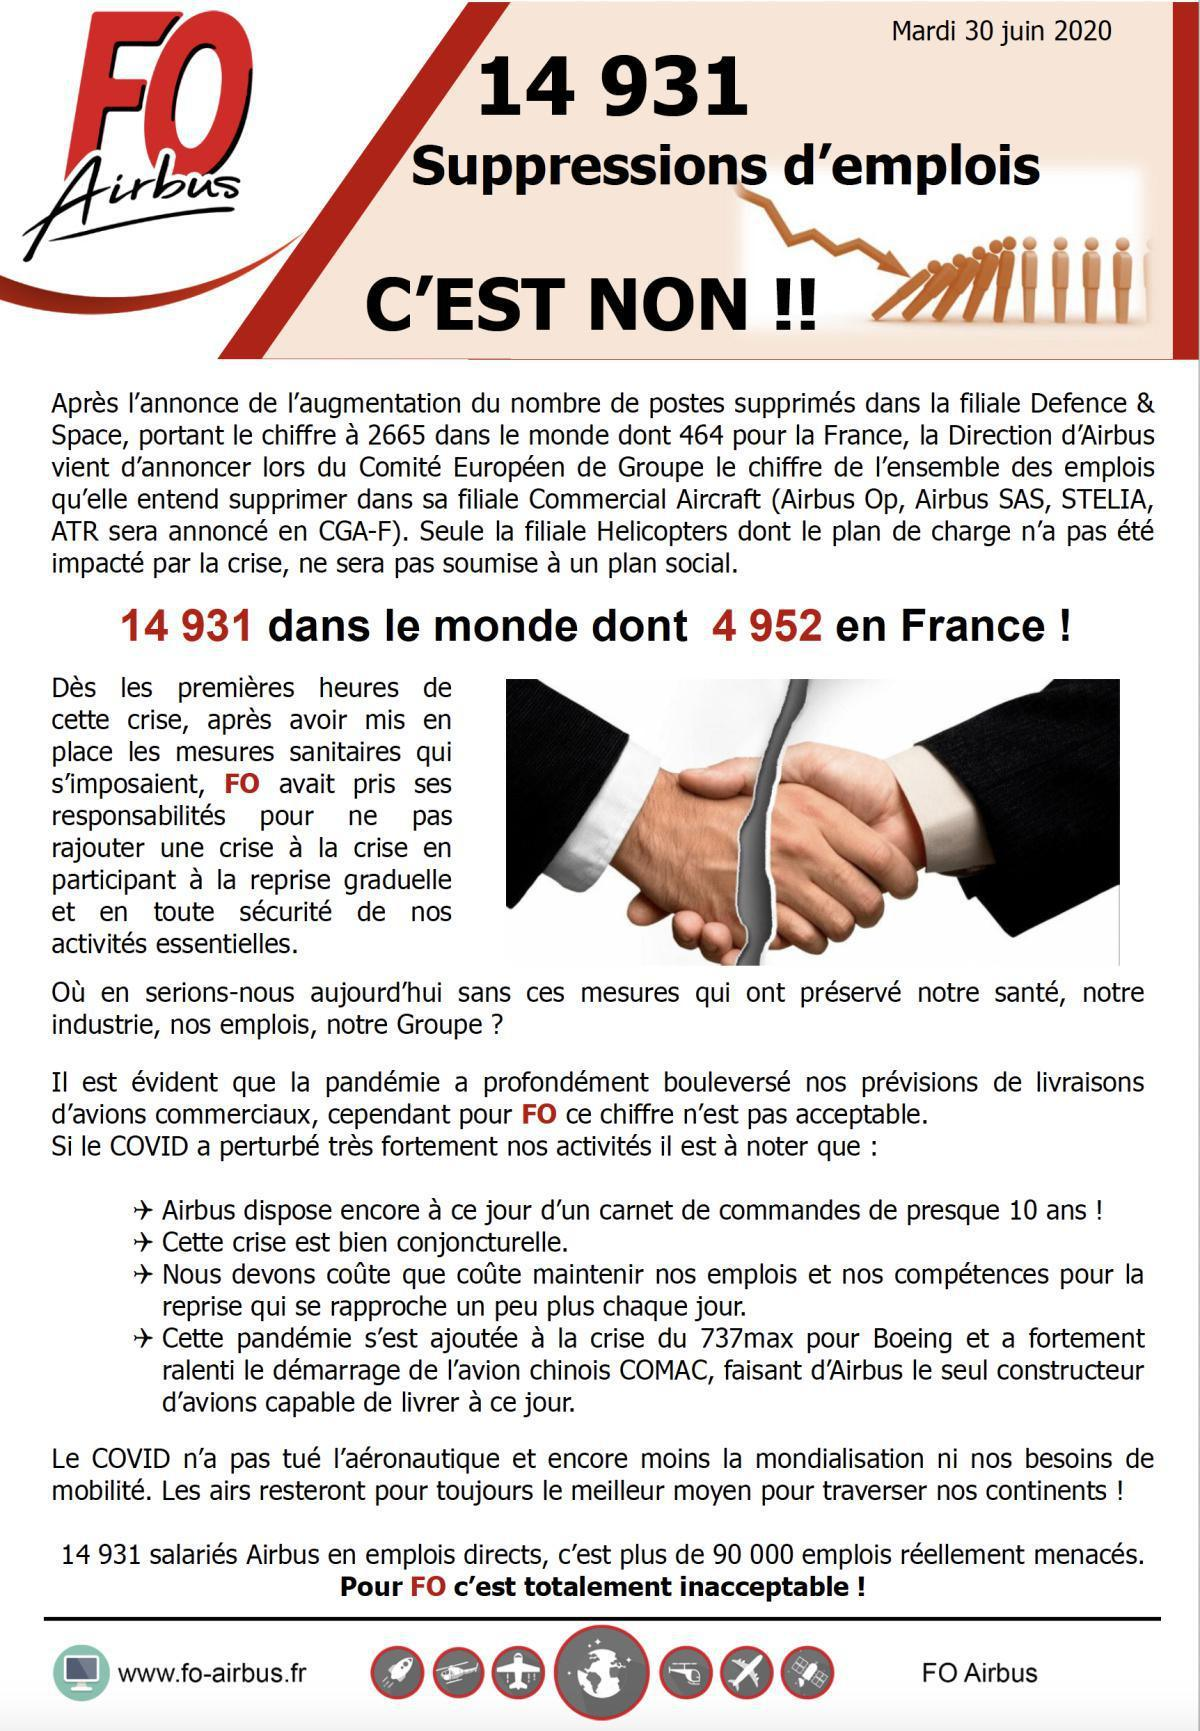 14931 suppressions d'emplois C'EST NON !!!